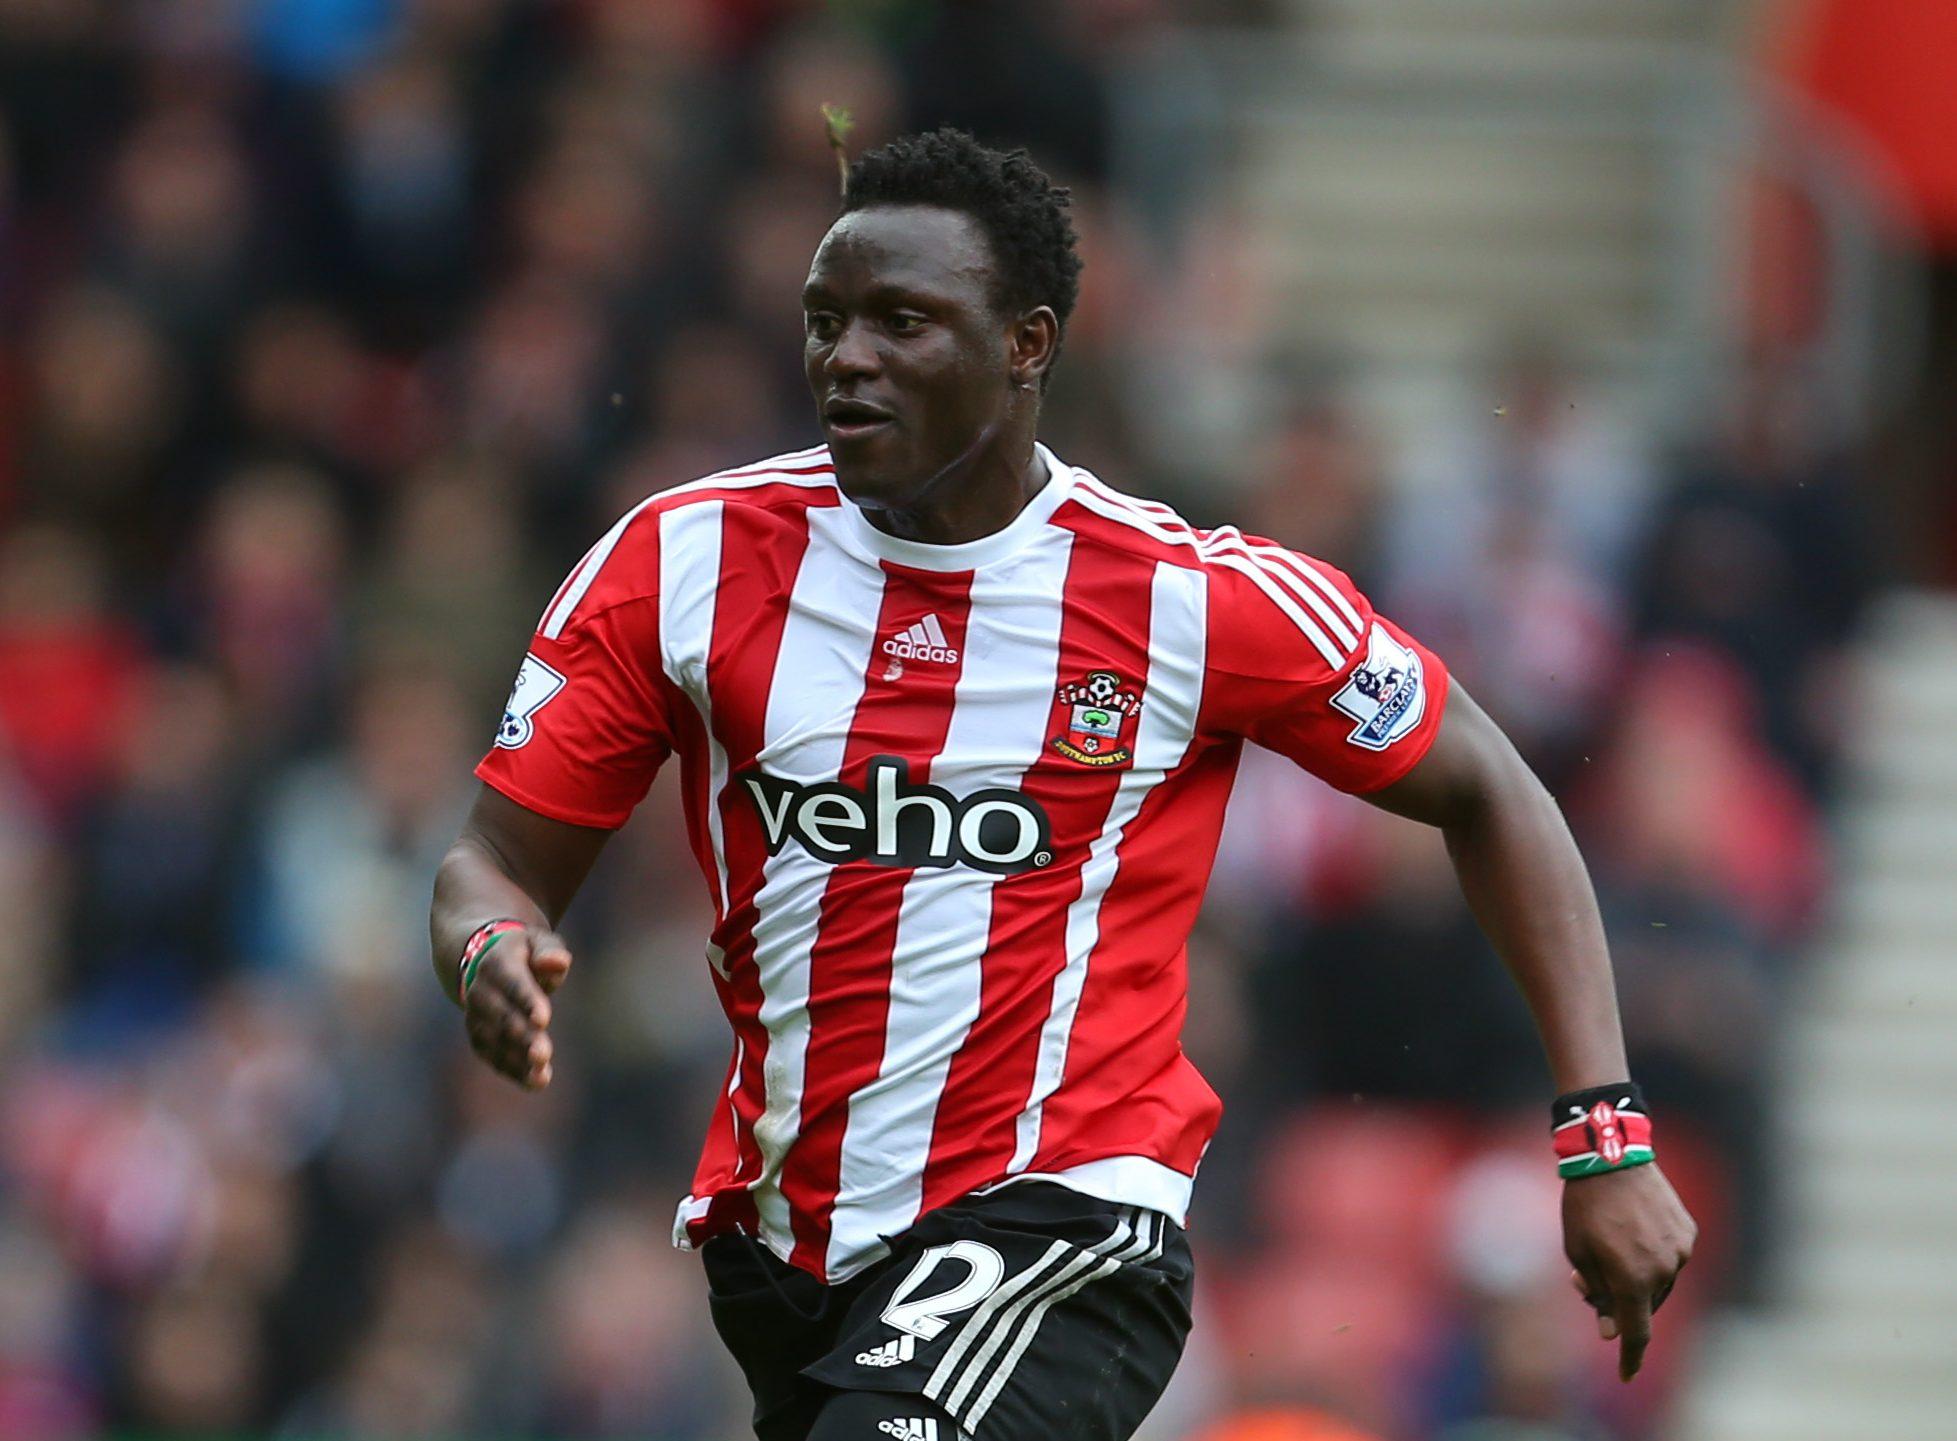 Victor Wanyama set for medical ahead of Tottenham transfer